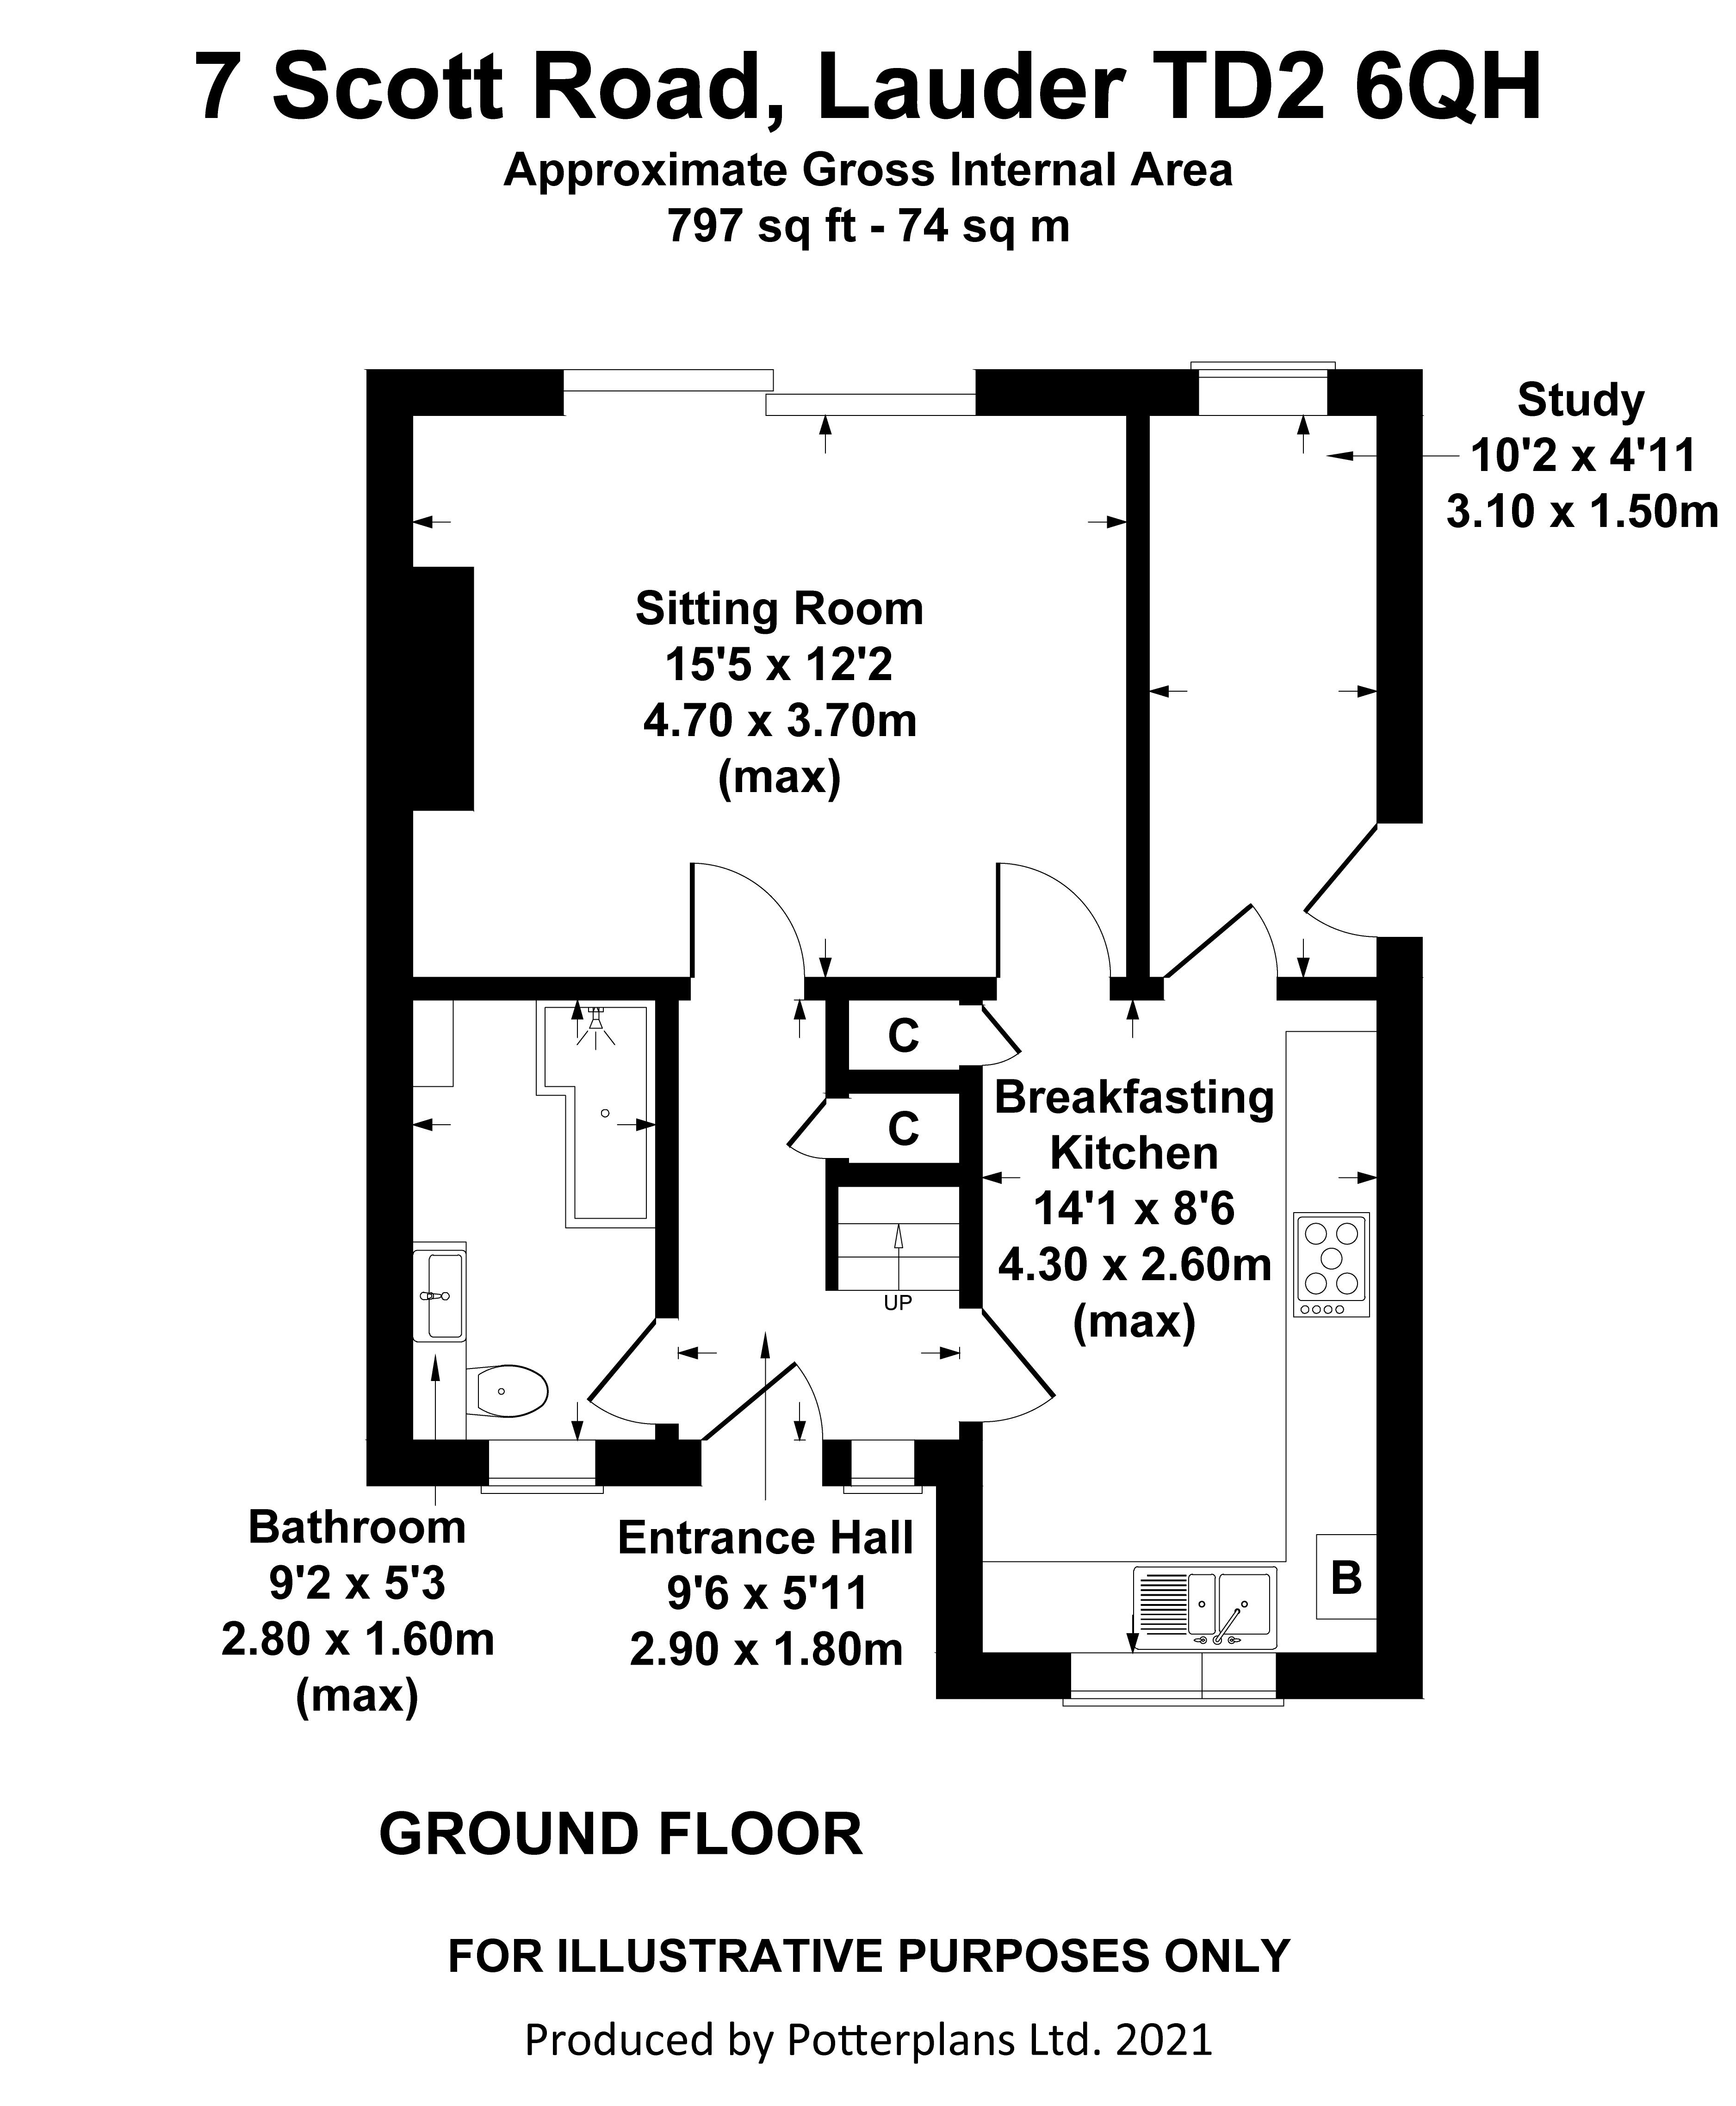 7 Scott Road Ground Floor